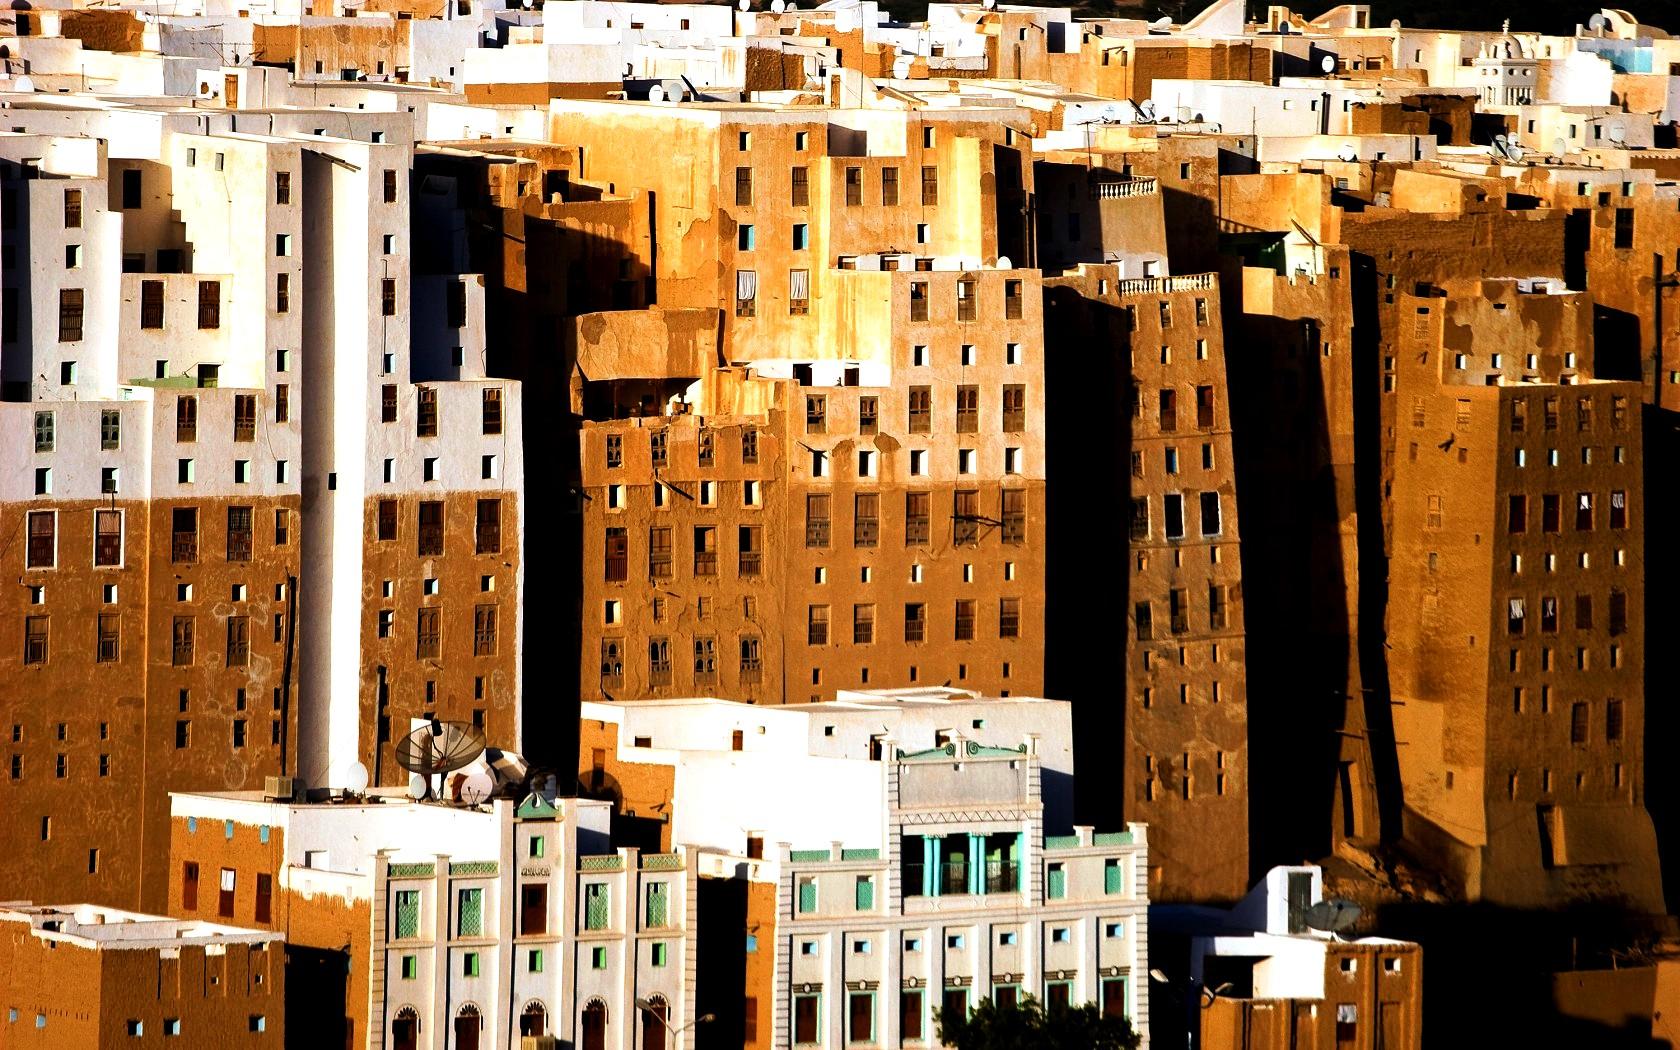 жилища шибама